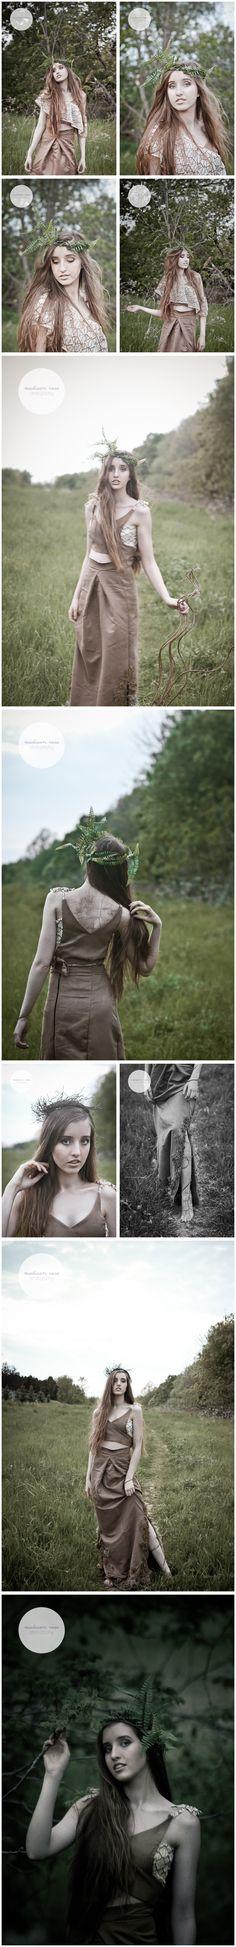 hamadryad concept photography by Madison Rose Photography in Hamilton, Ontario #fashion #style #photography #concept #mythological